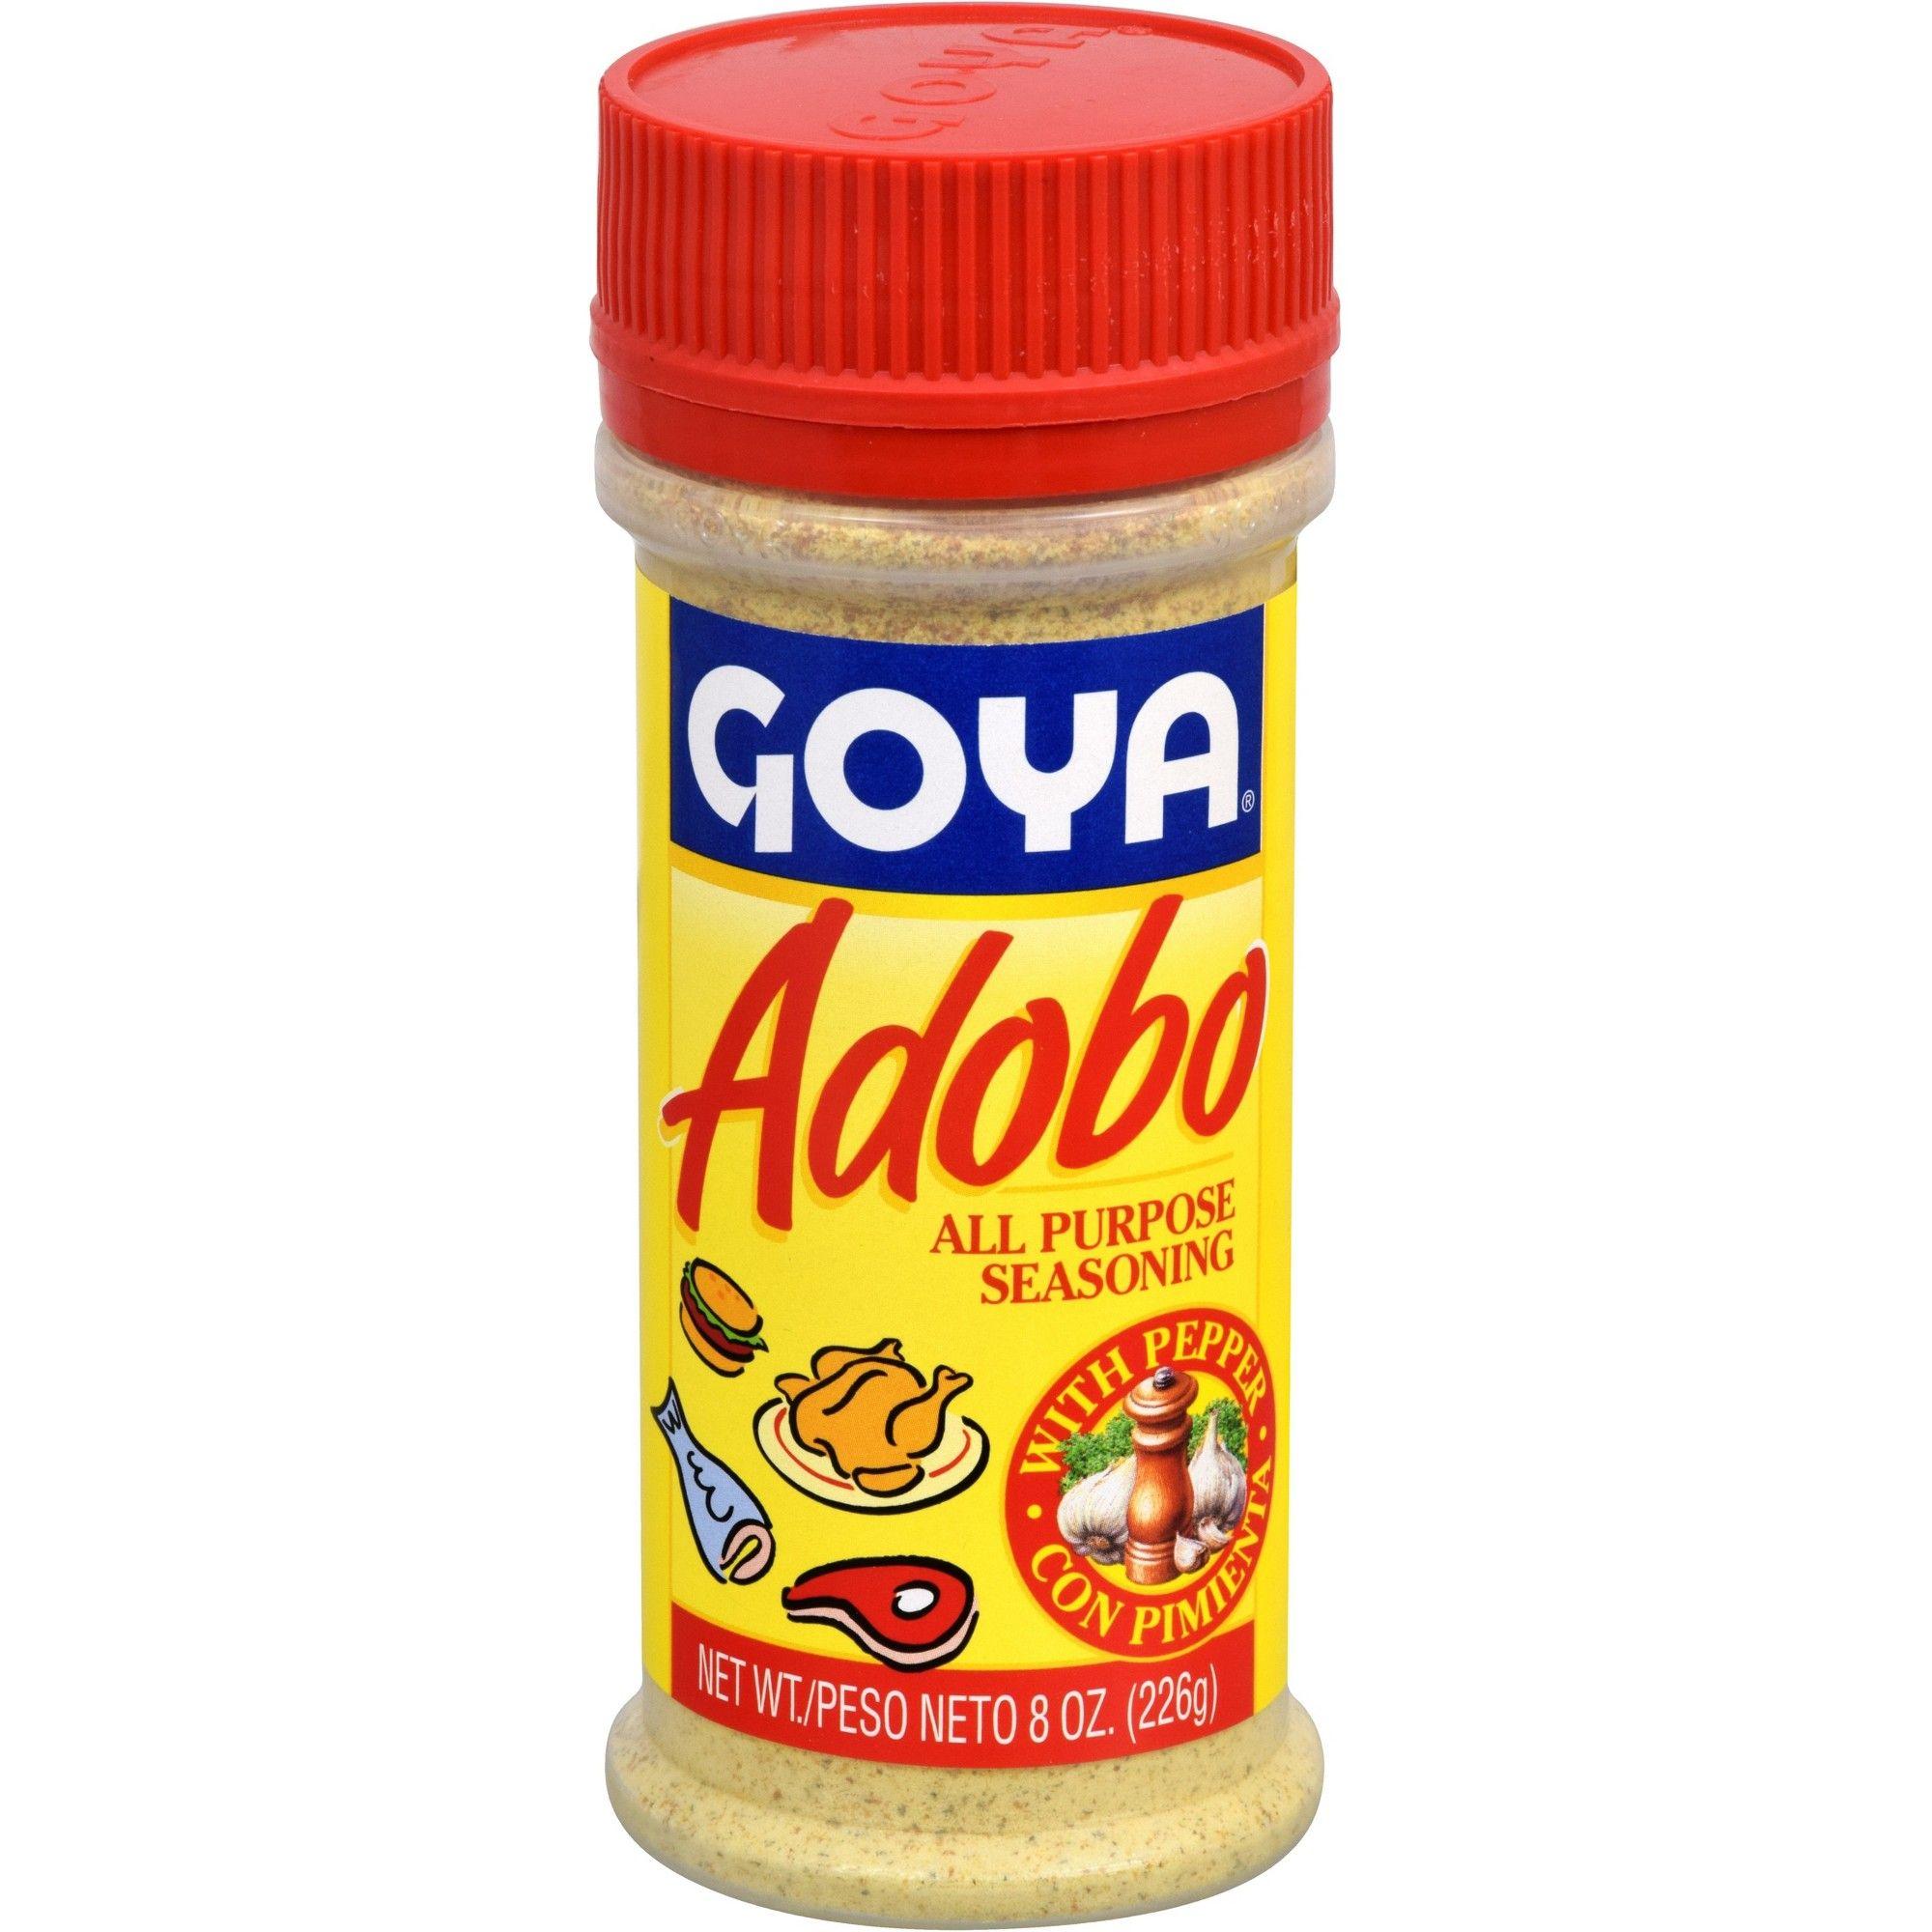 Goya Adobo All Purpose Seasoning 8 oz, Adult Unisex All